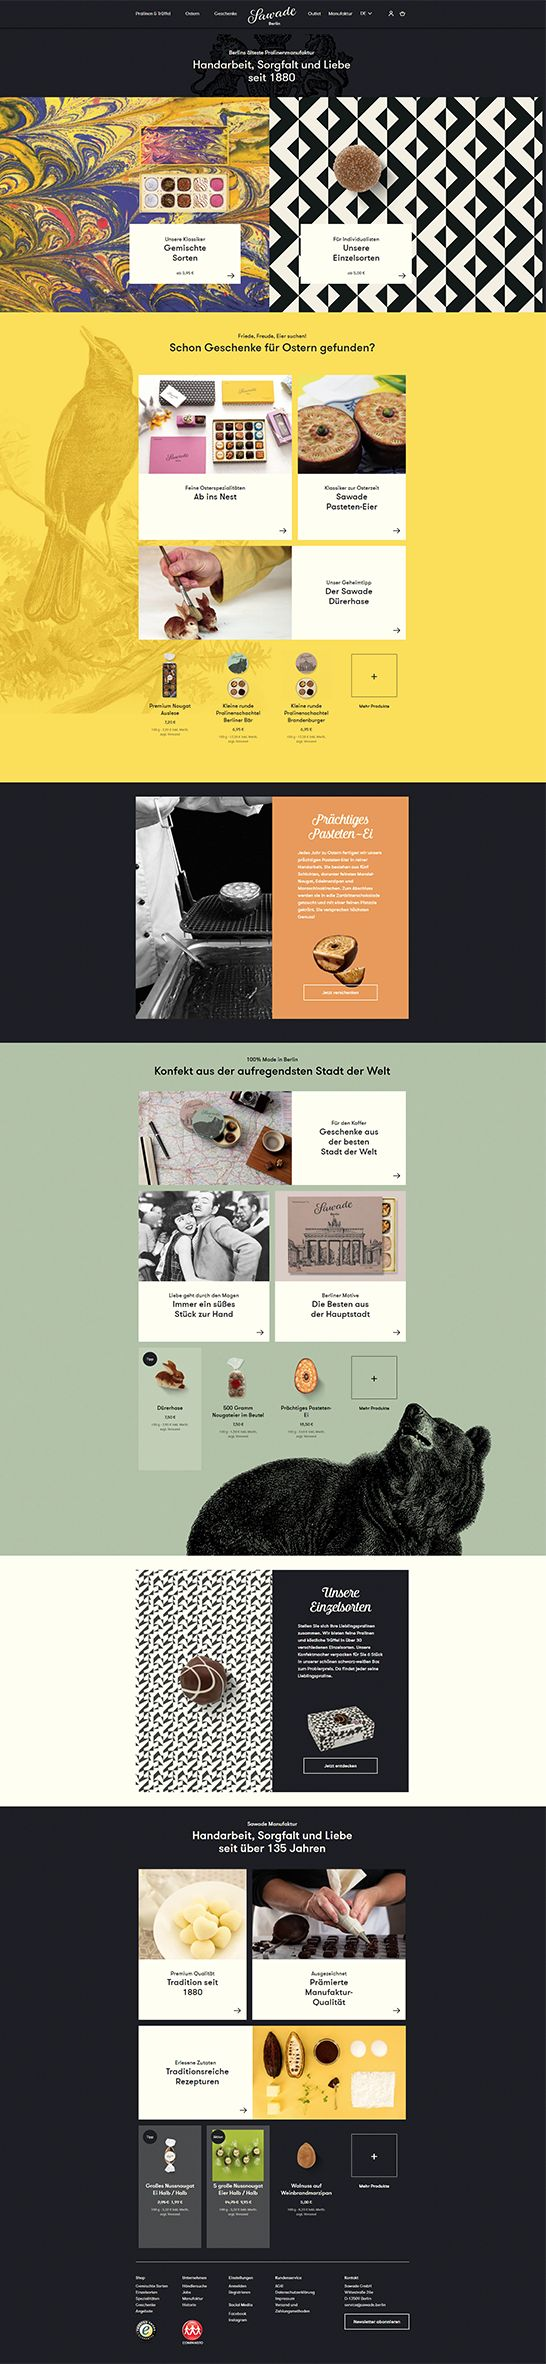 #ShopwareDesign #ShopwareTheme #ShopwareShop #eCommerce #eCommerceSoftware #eCommerceplatform #Onlineshop #Food #pralines #Template #traditional #handmade #highquality #madeinberlin #chocolate #manufactory #storytelling #sawade